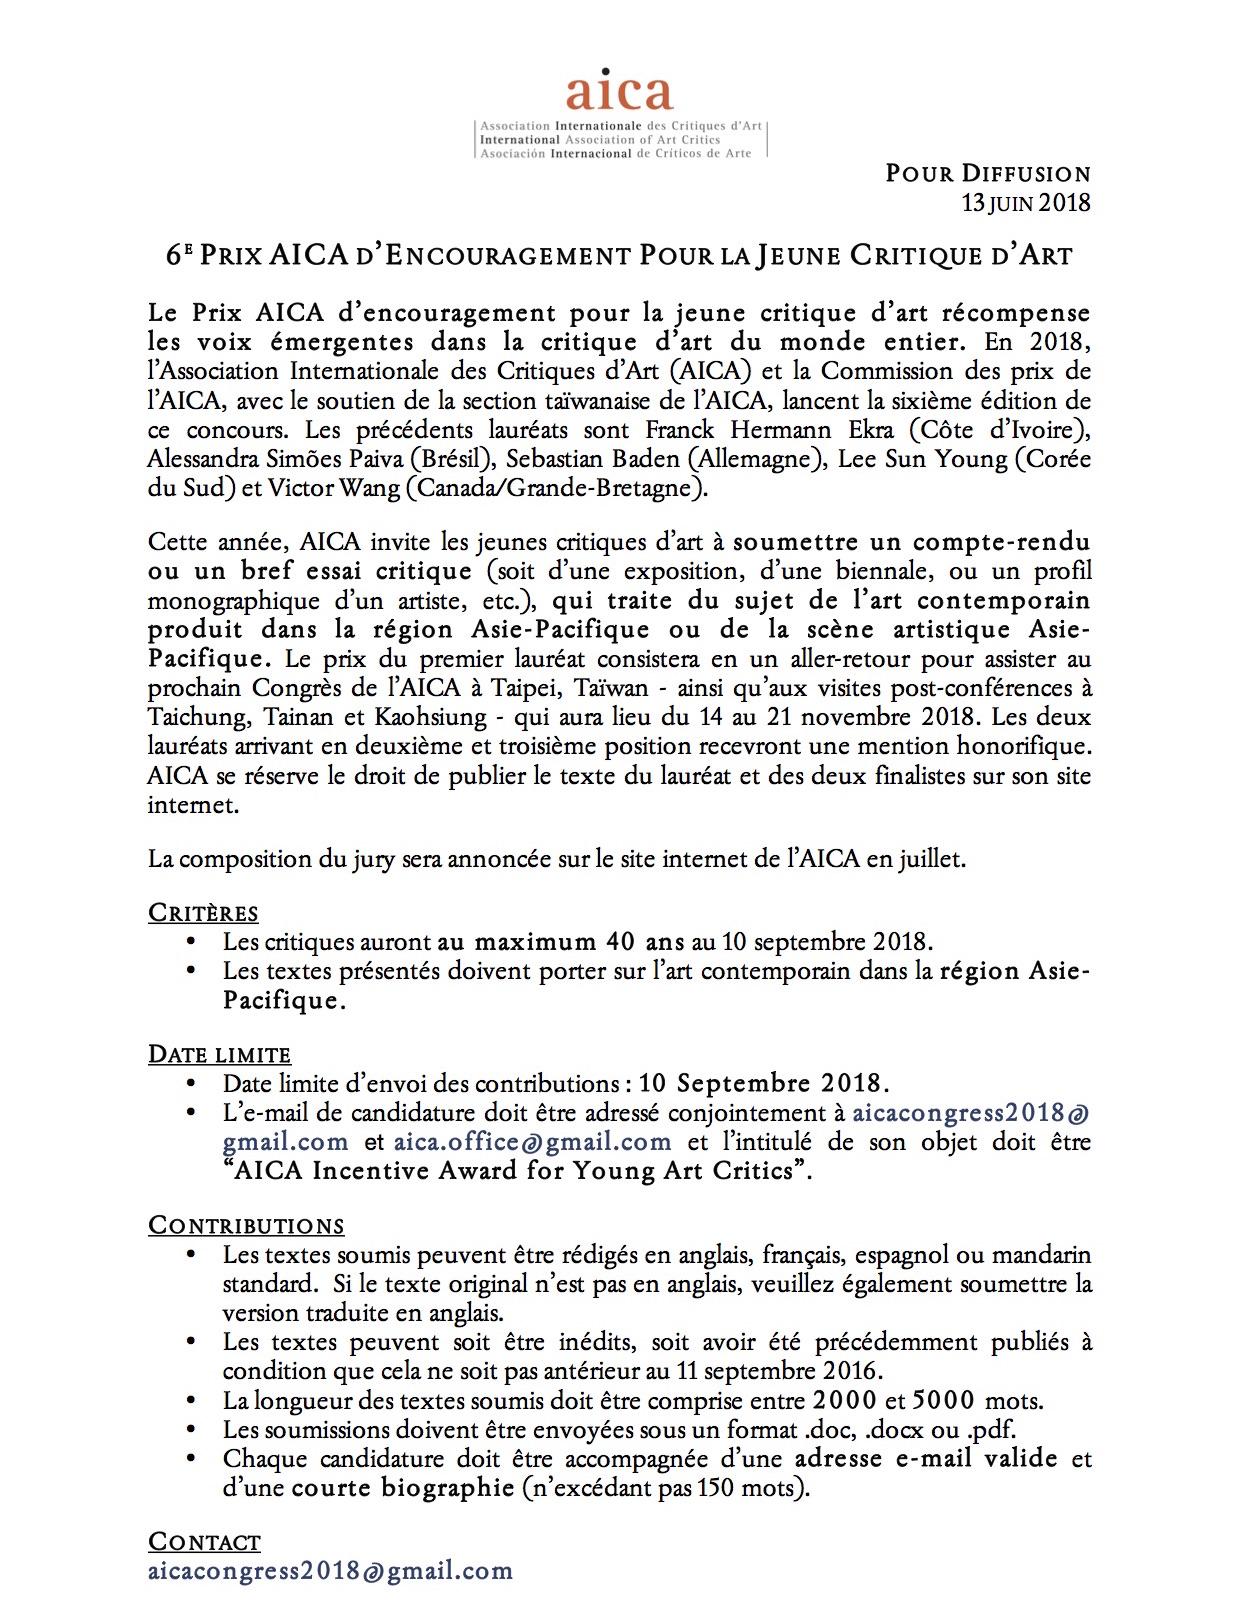 AICA_PrixEncouragementPourJeunesCritiquesDart_2018_1.jpg